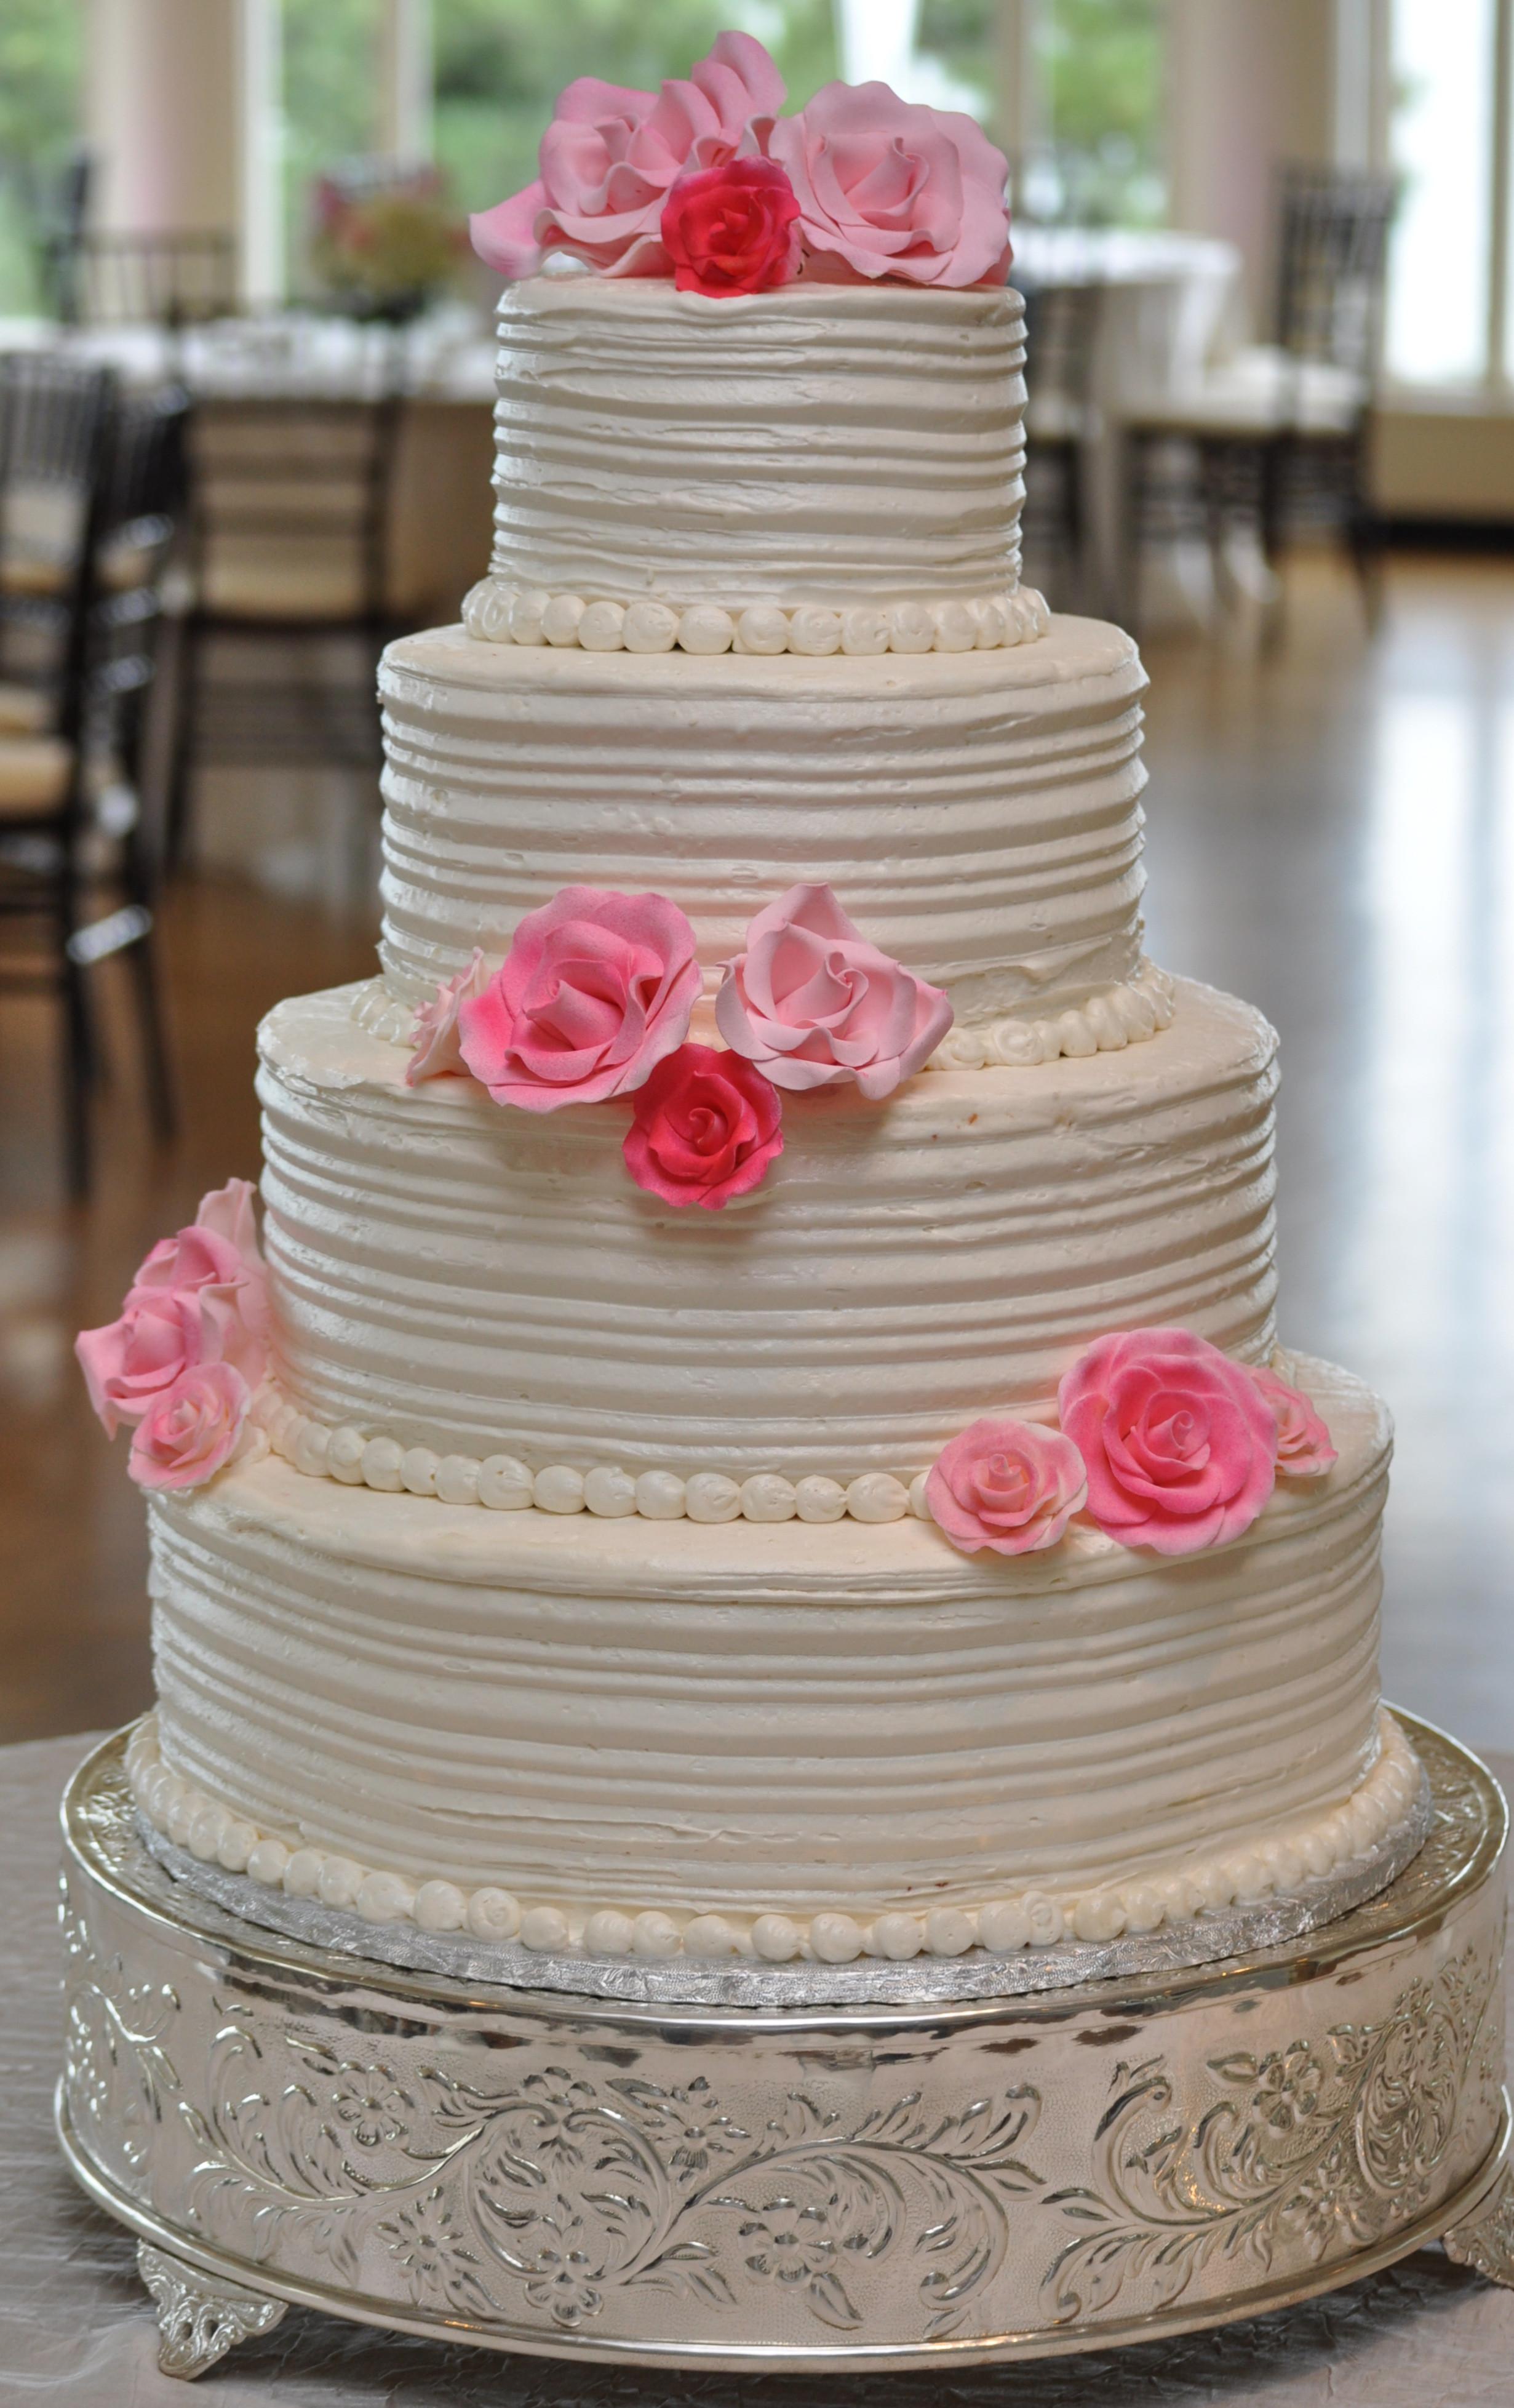 Iced Wedding Cakes  weddinggallery4